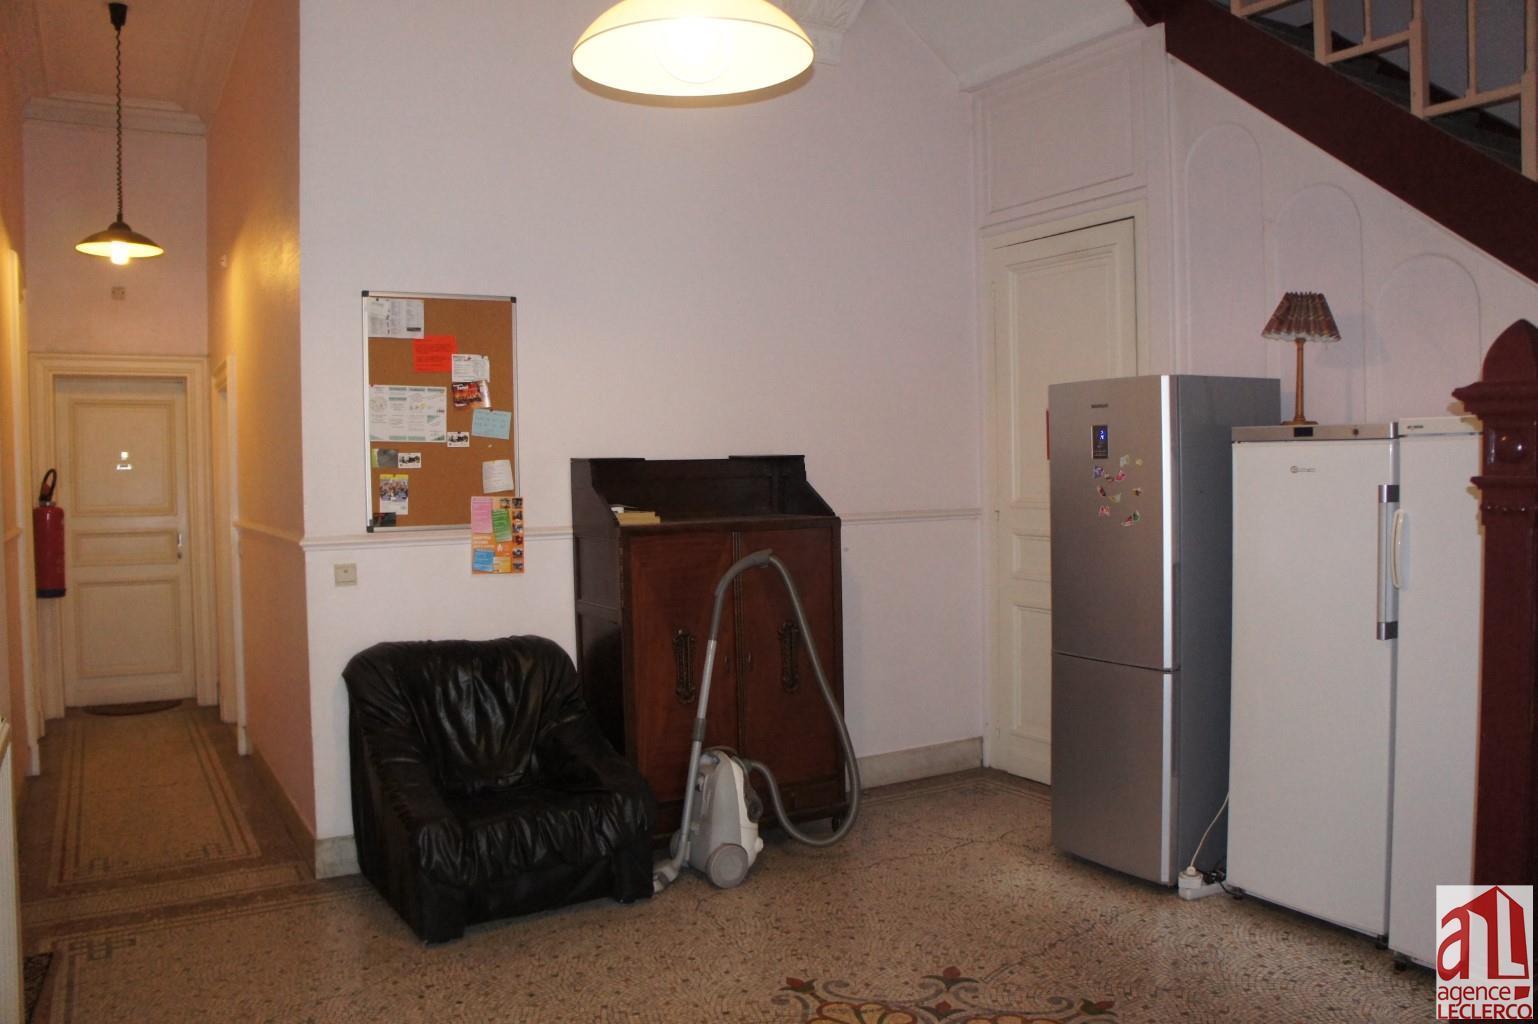 Chambre étudiant - Tournai - #4042594-15